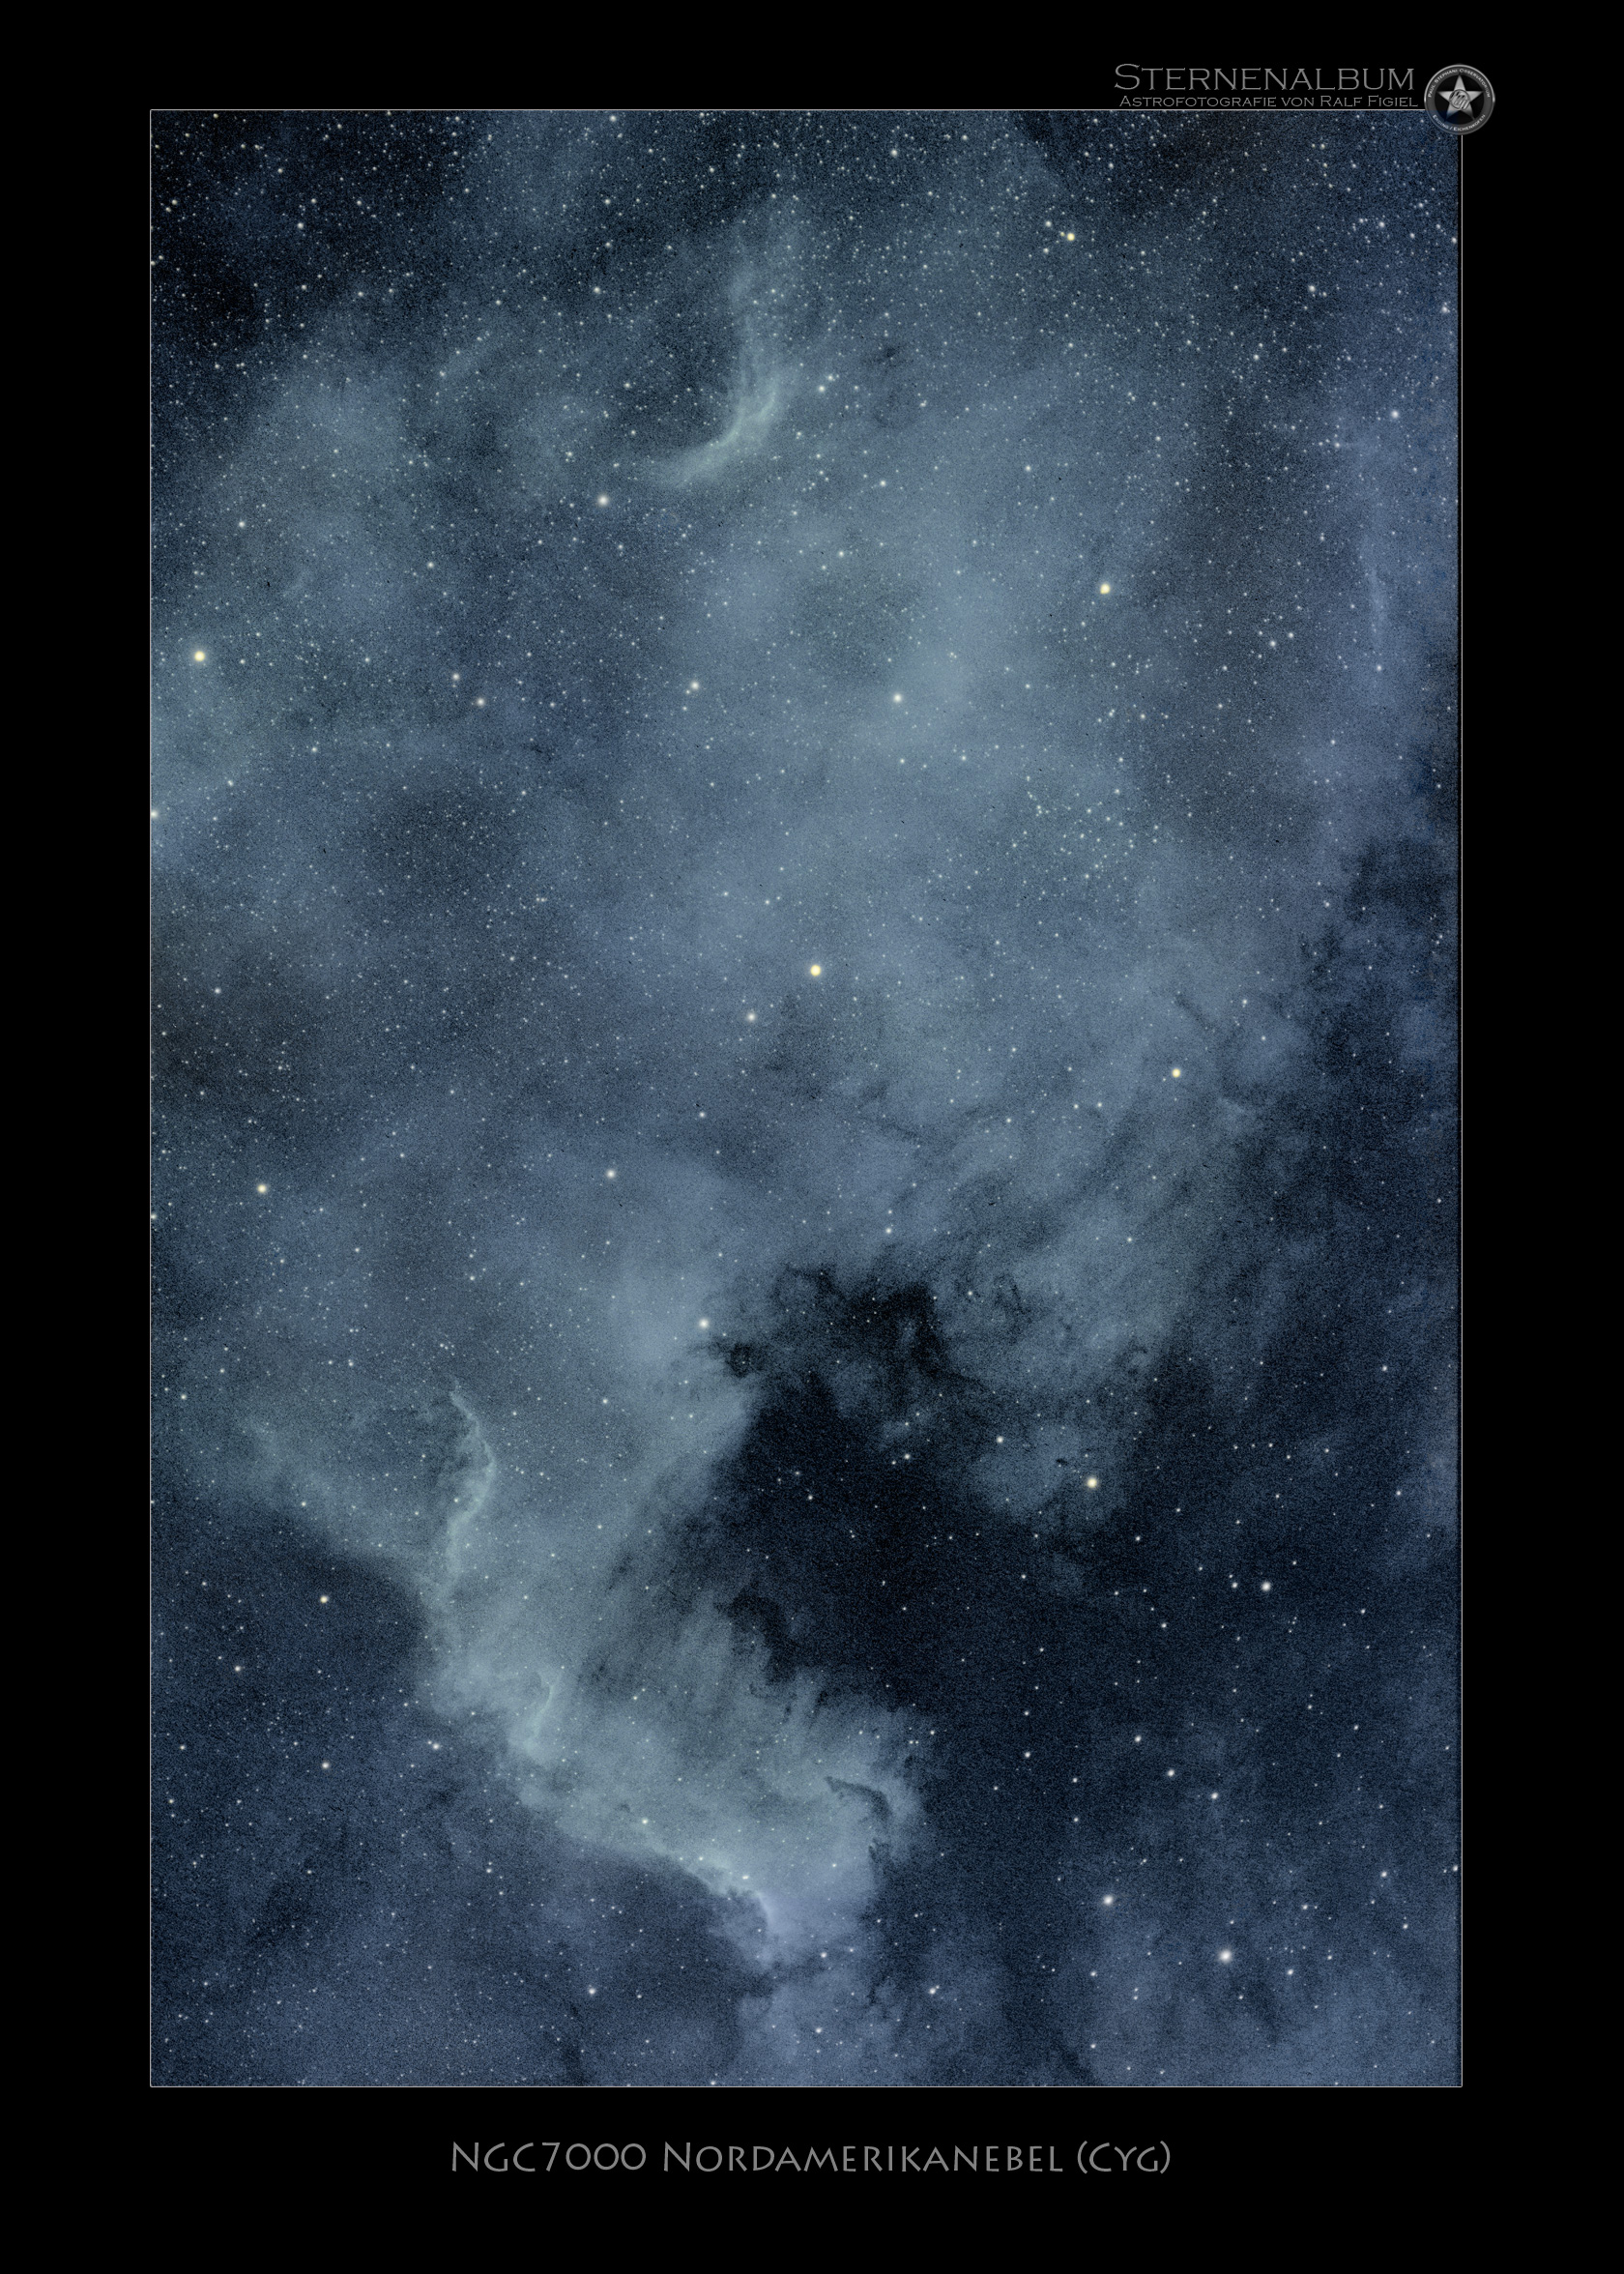 NGC 7000 - Nordamerikanebel bicolor